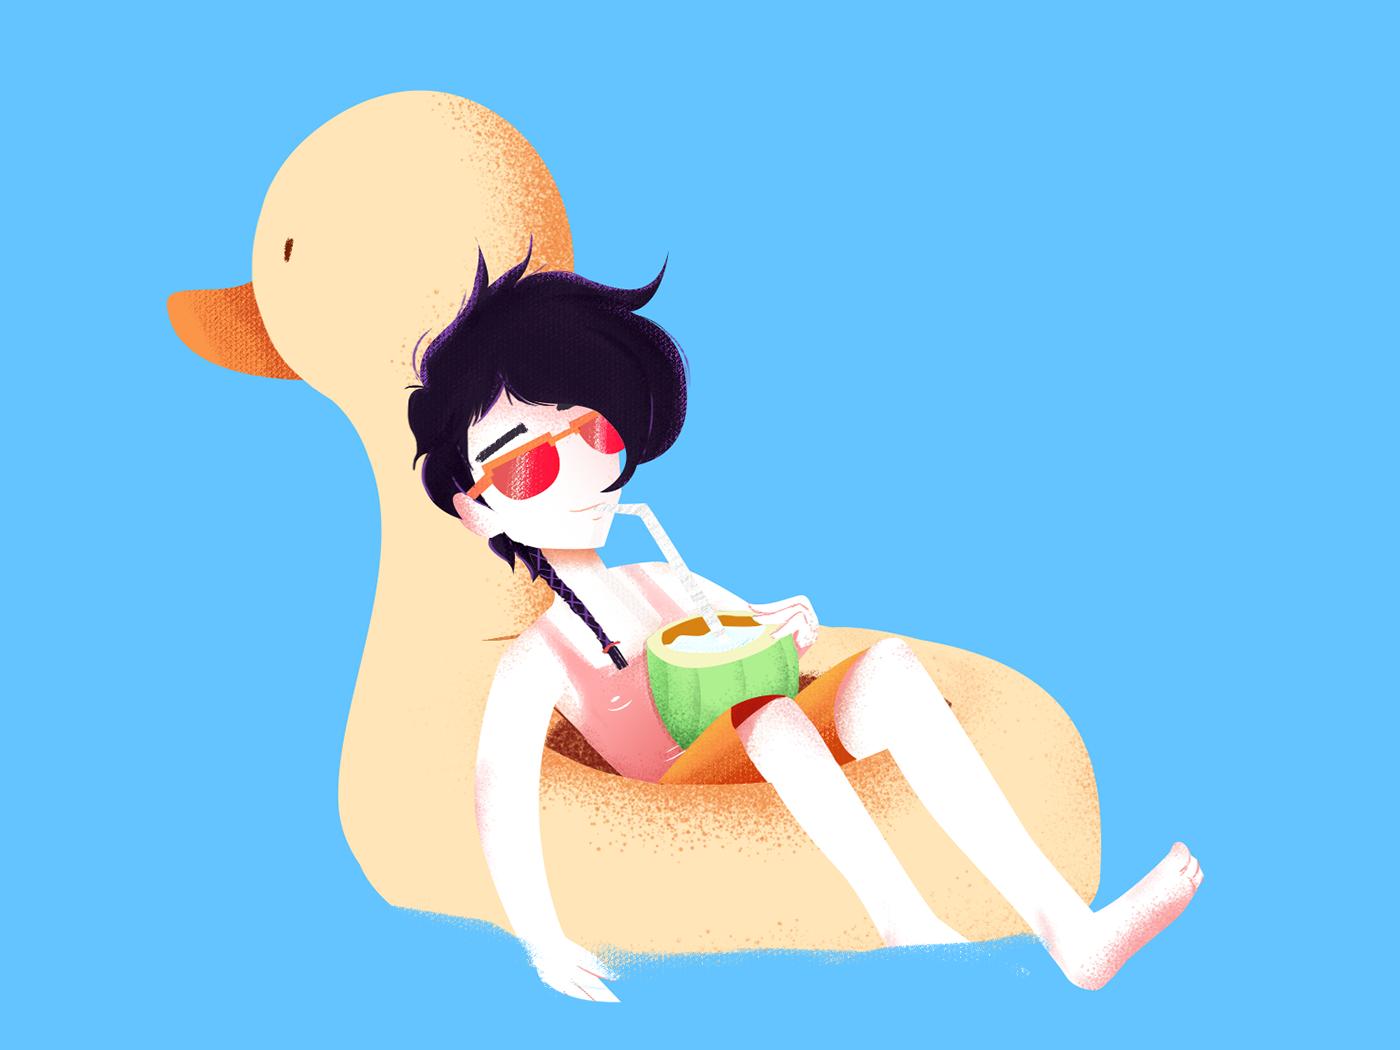 Summer times tan cocunut duck summertime photoshop illustration